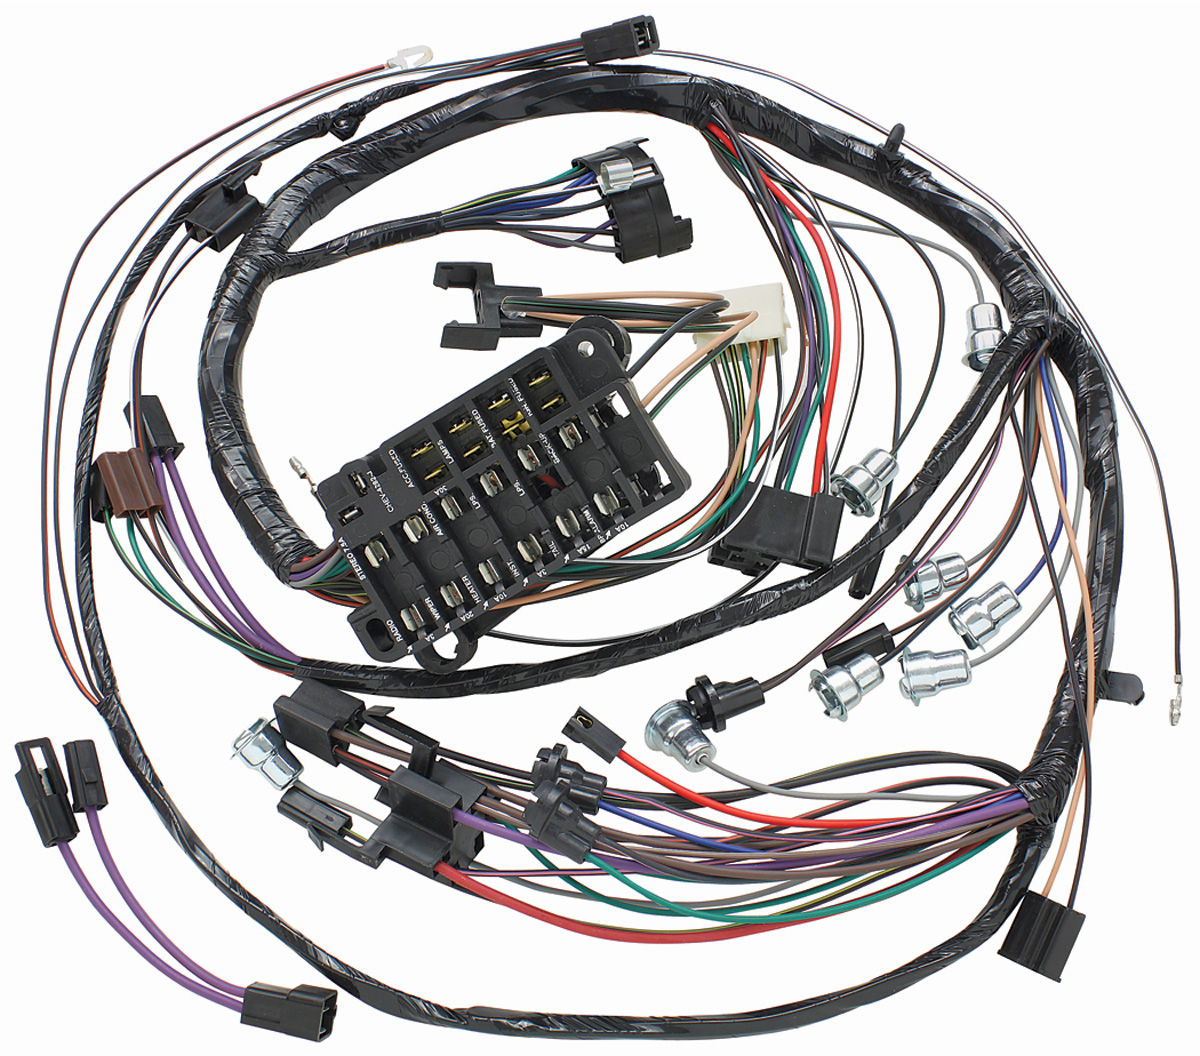 hight resolution of 1971 el camino dash instrument panel harness all sweep gauge type